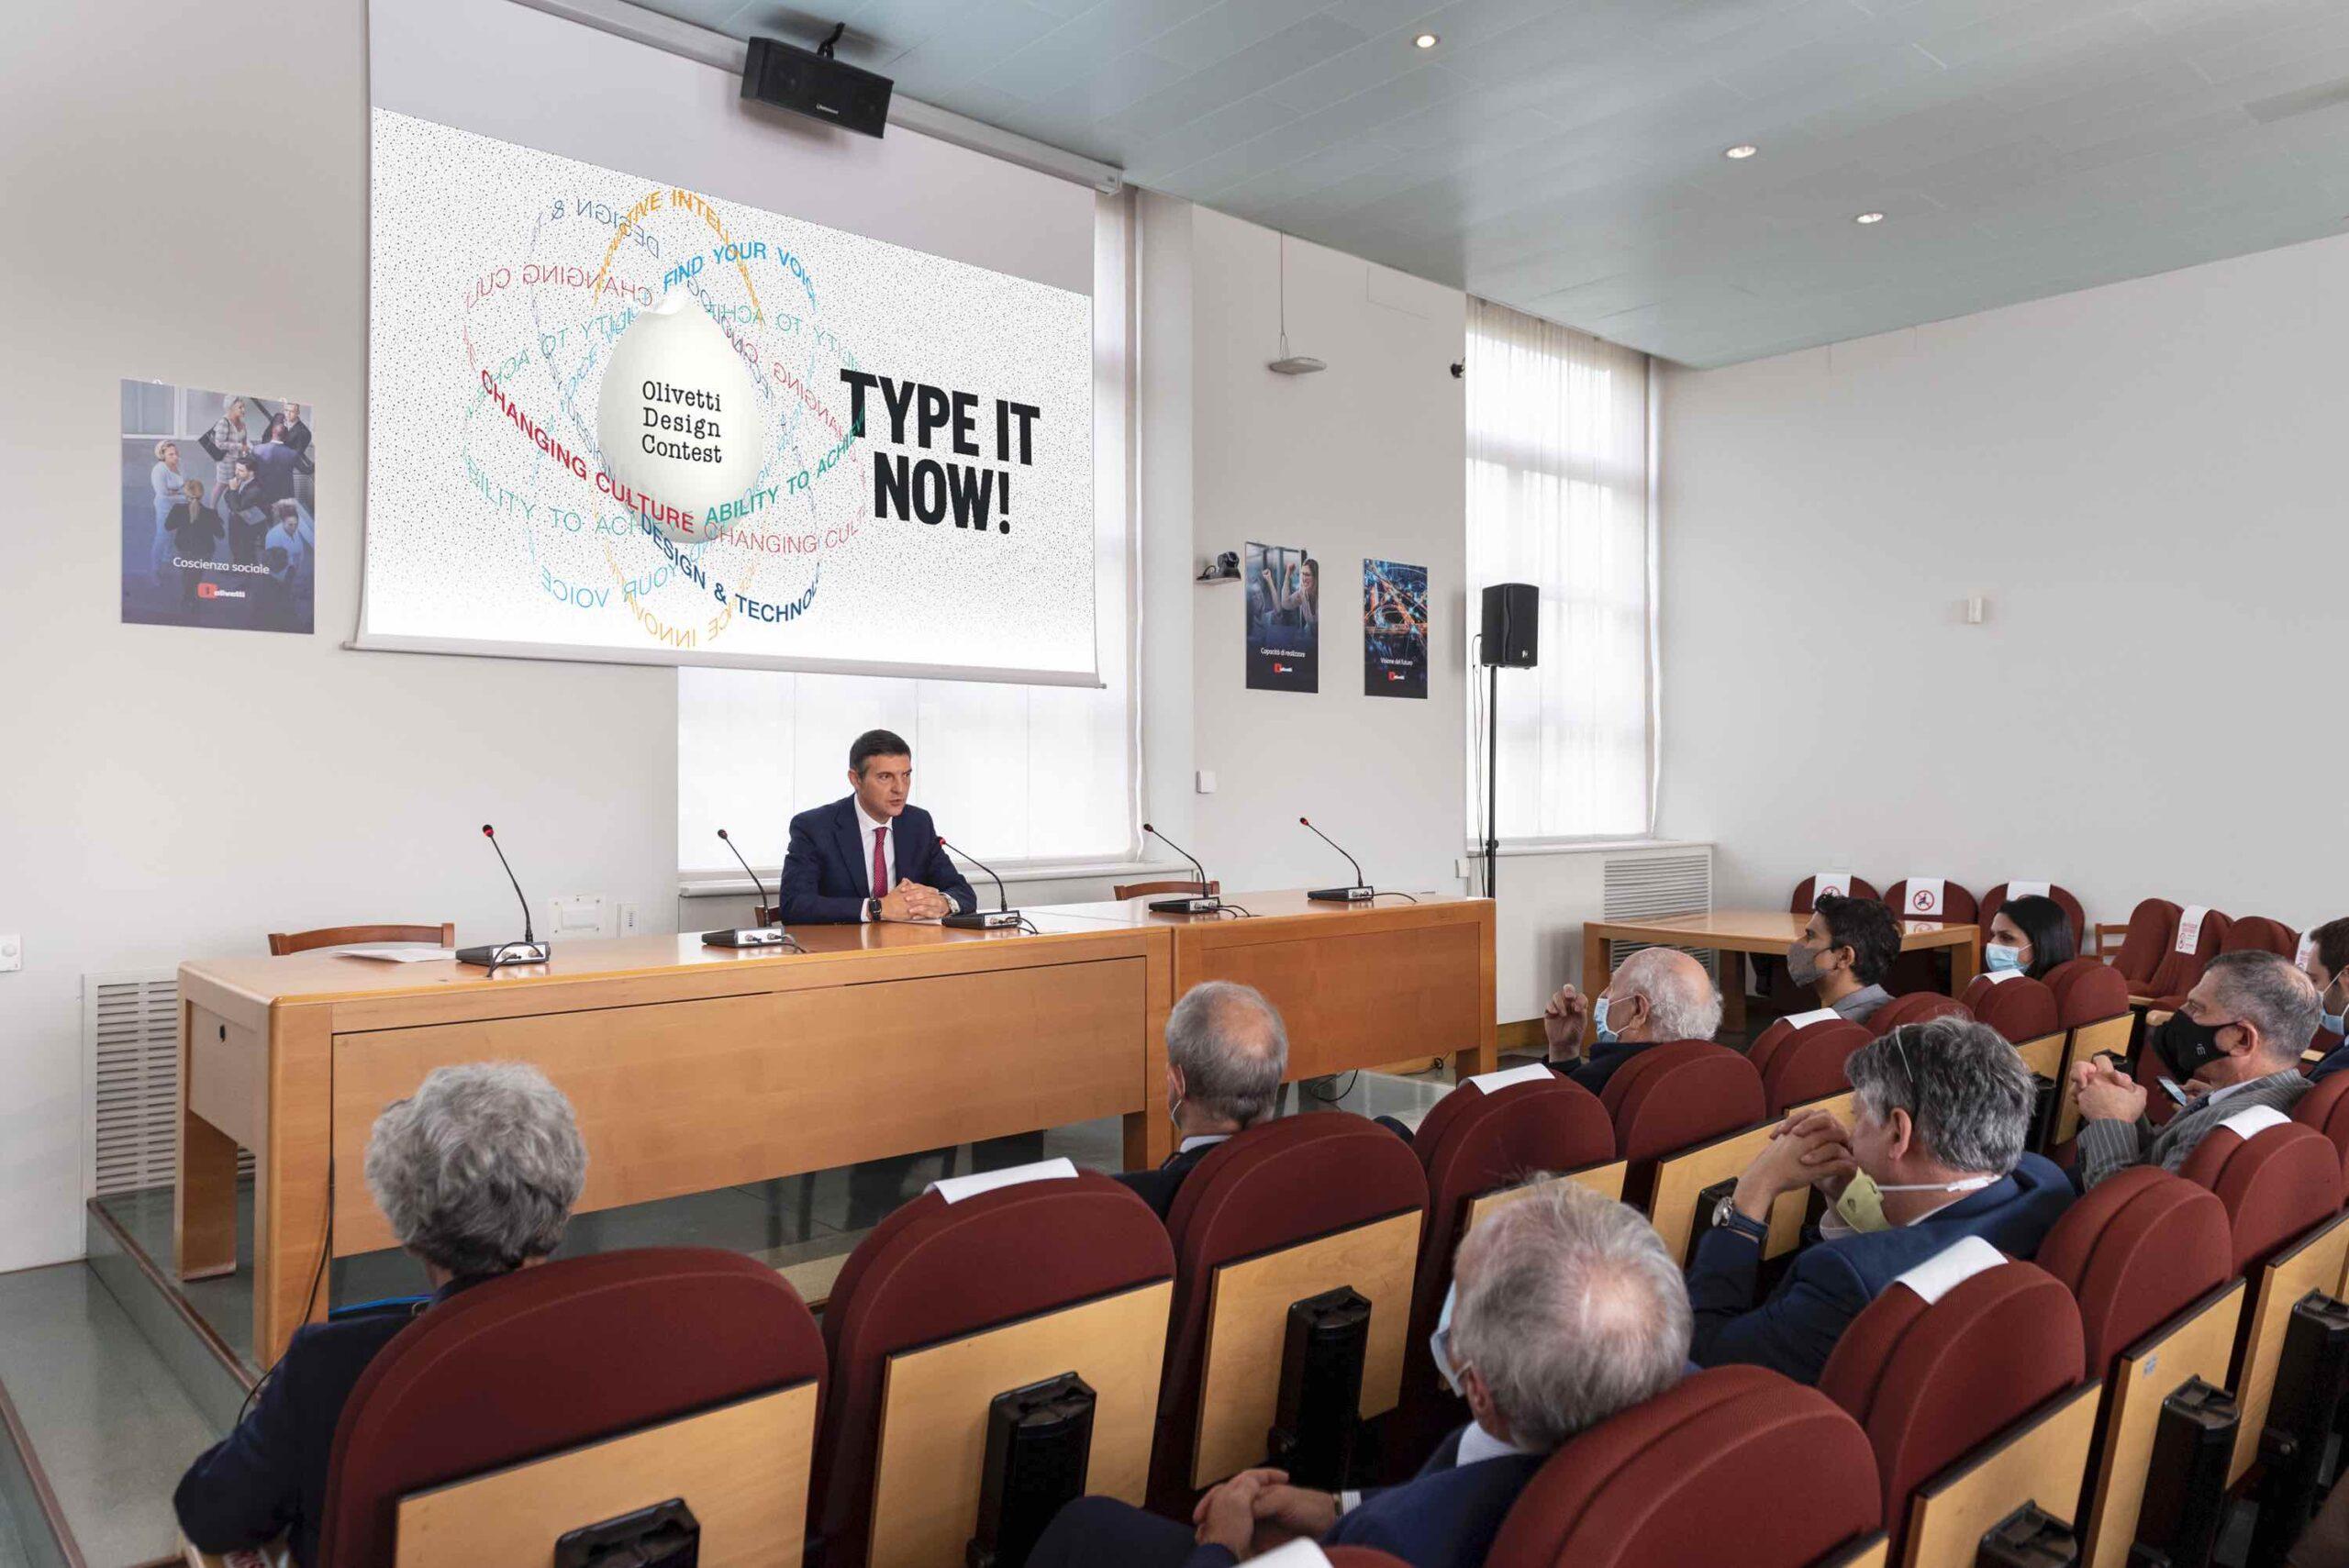 Olivetti Design Contest 2020/2021_Olivetti Design Contest 2020 2021 scaled